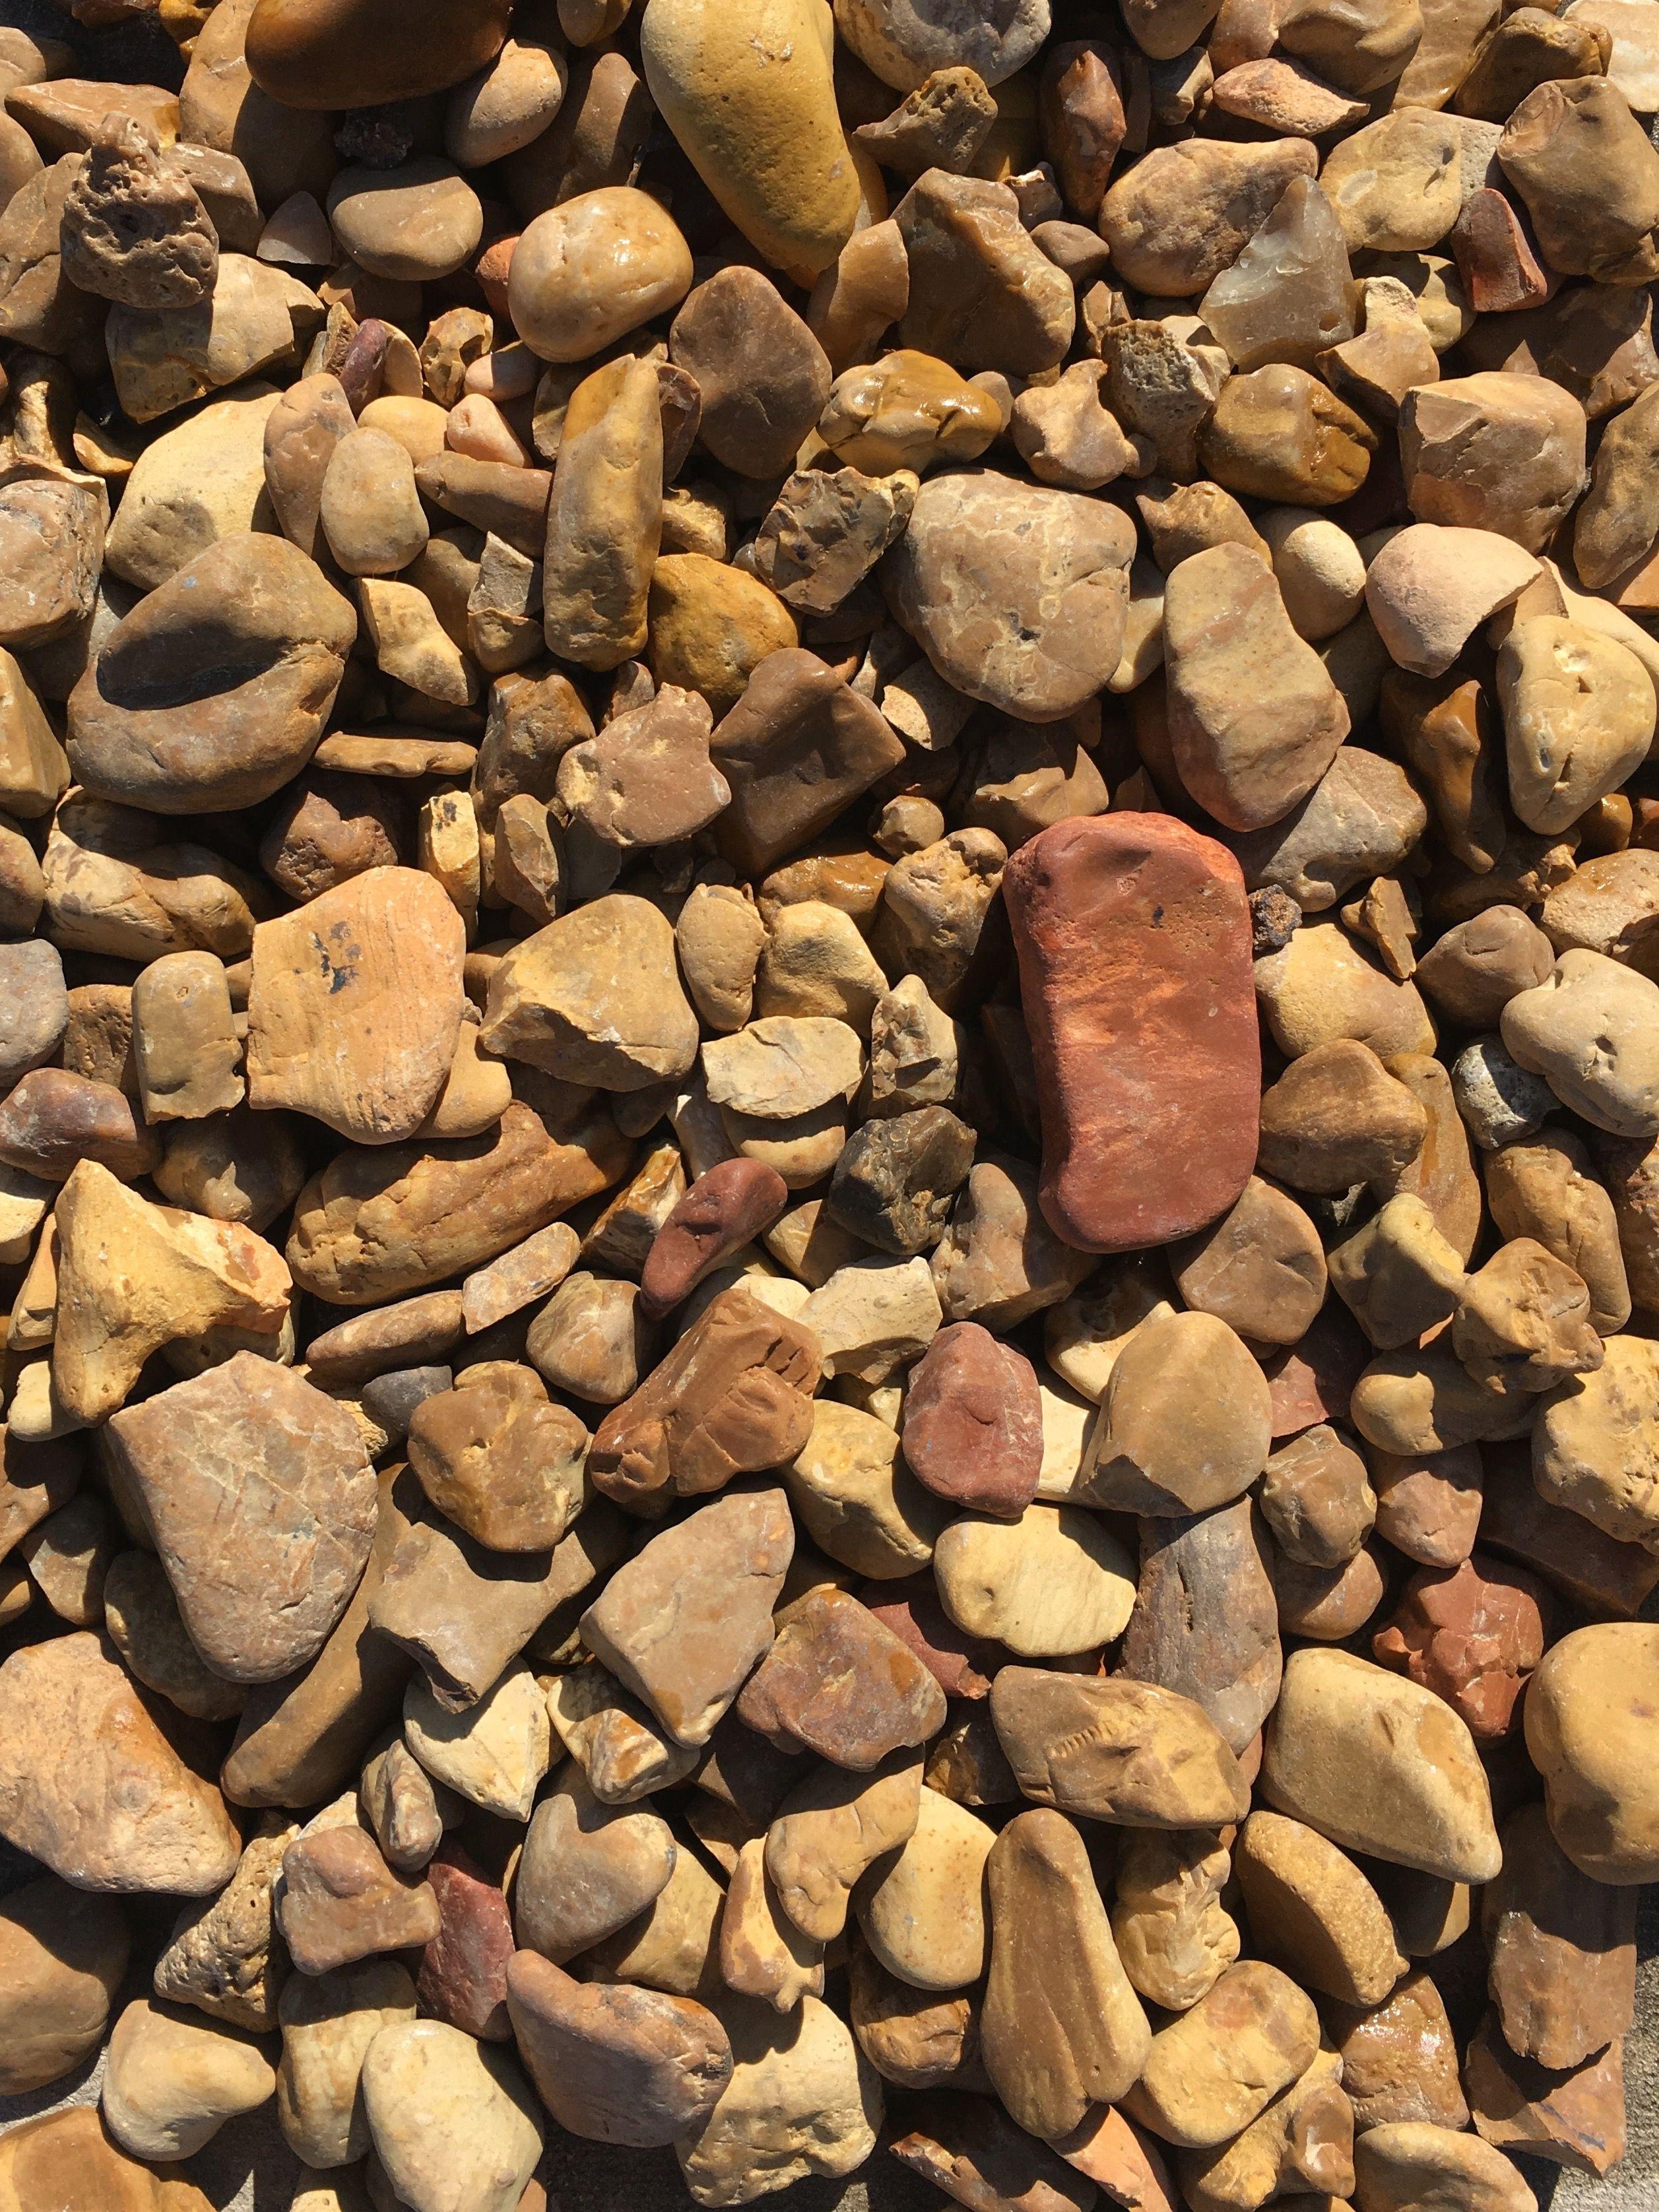 Chestnut Blend Decorative Landscape Gravel Decorative Gravel Gravel Landscape